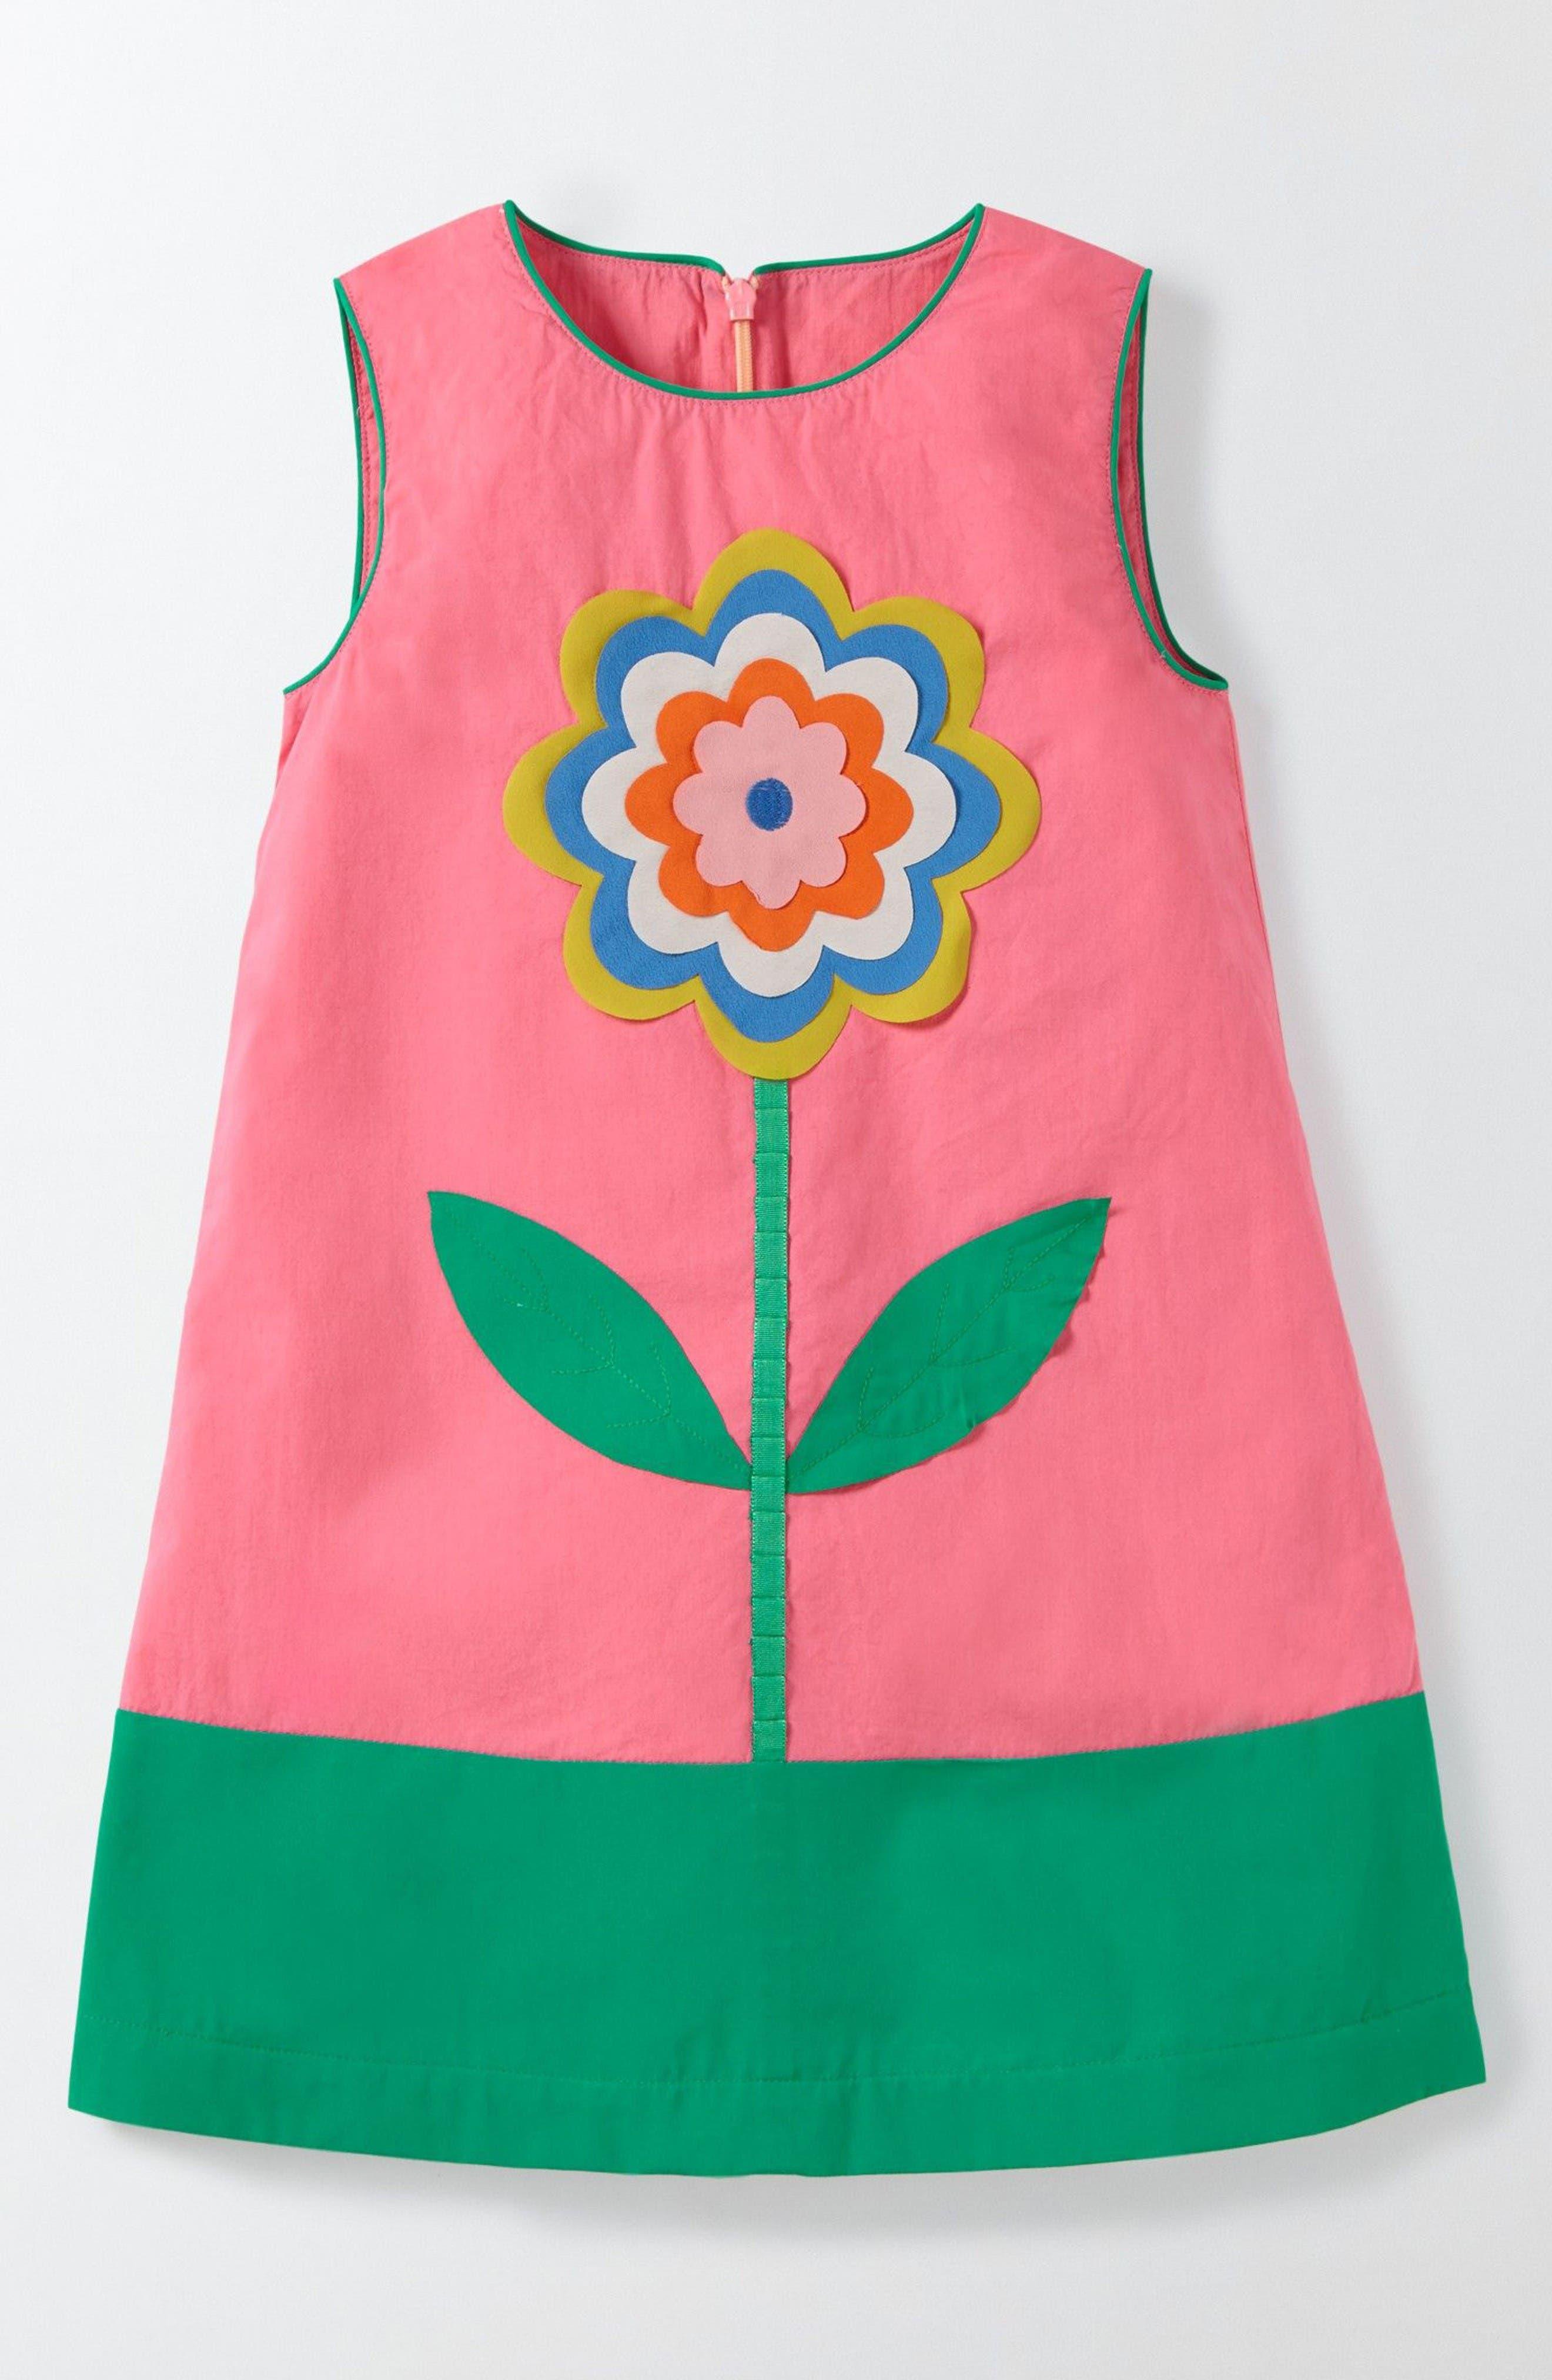 Alternate Image 1 Selected - Mini Boden Fun Shift Dress (Toddler Girls, Little Girls & Big Girls)